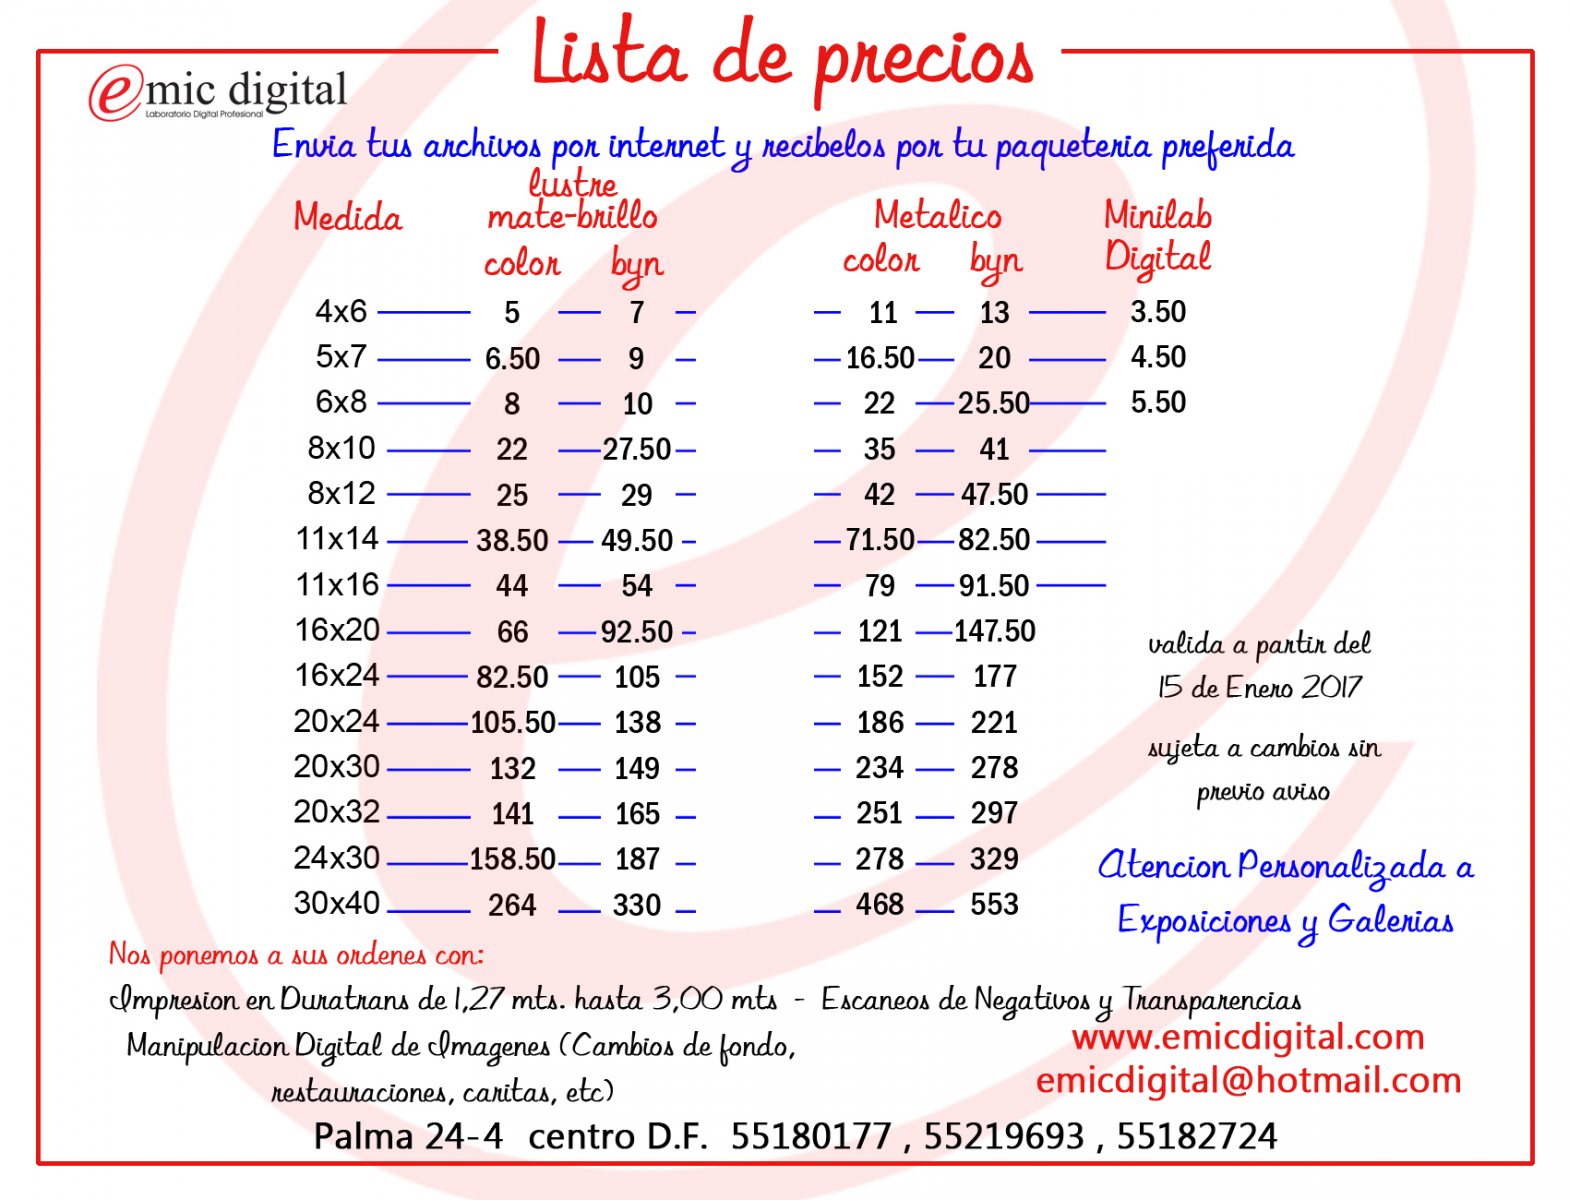 EMIC DIGITAL - Laboratorio Digital Profesional